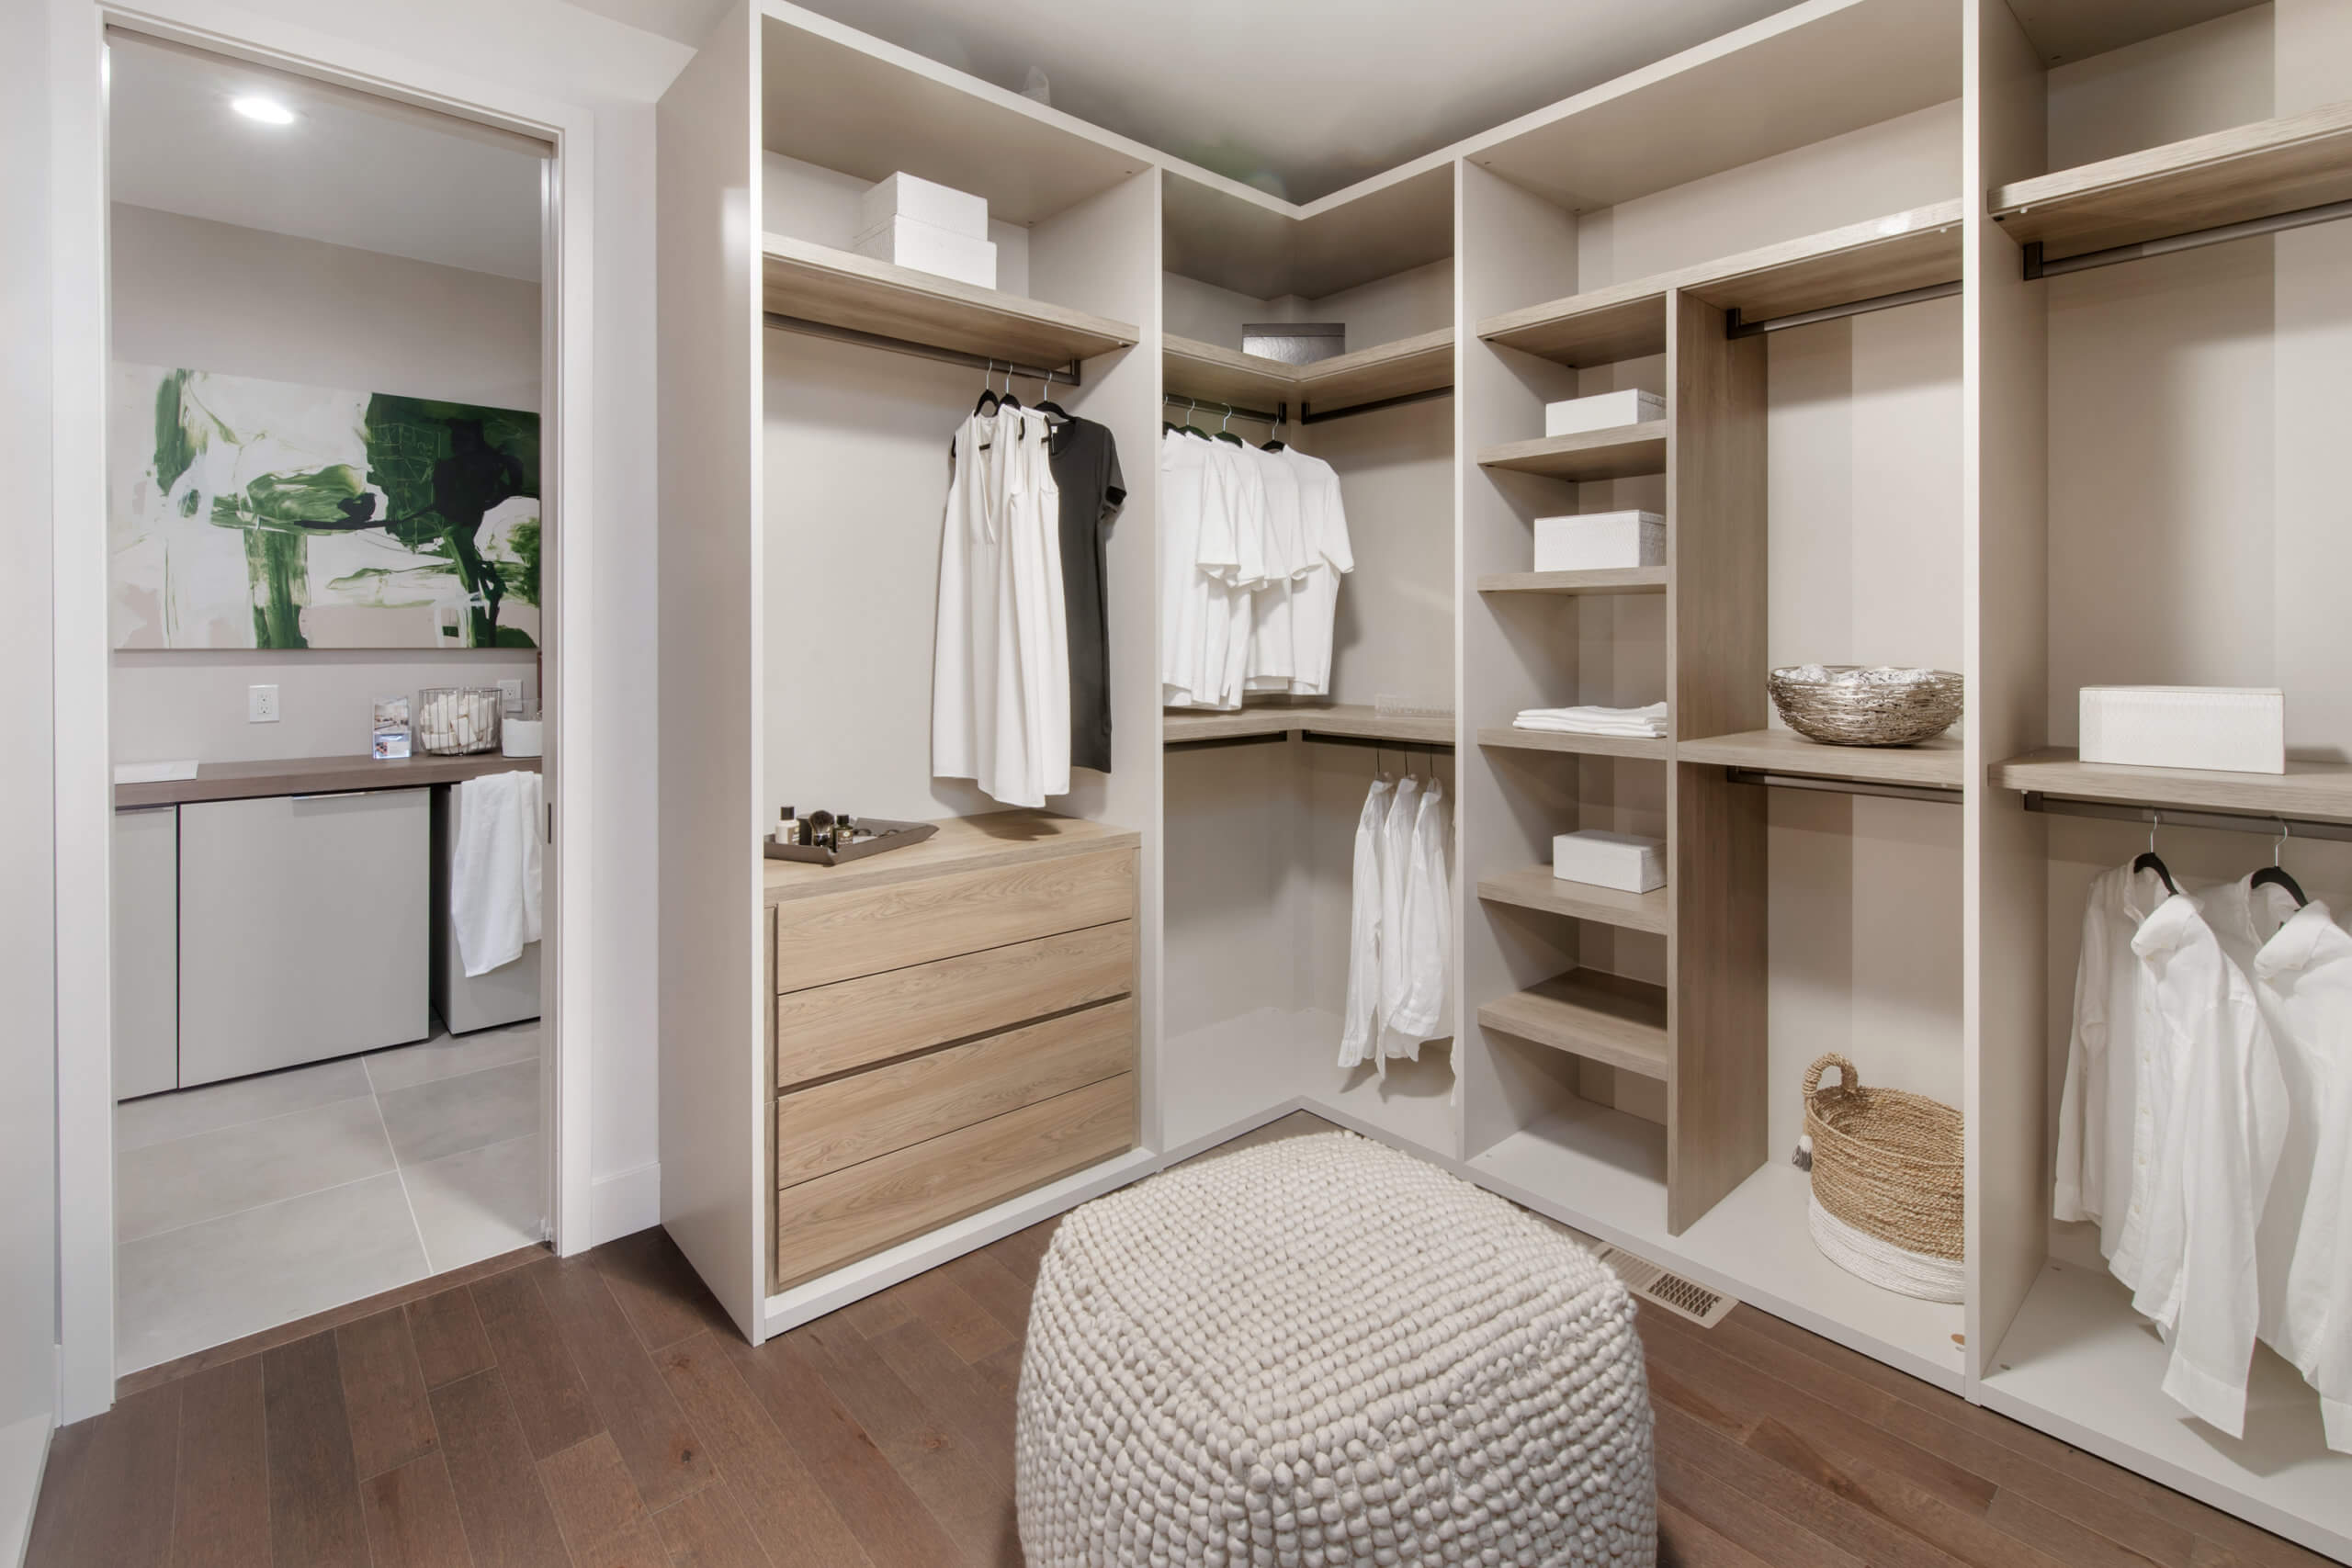 Custom walk-in closet featuring custom cabinetry by Pianca. Custom closed by interior designer RM Interiors.